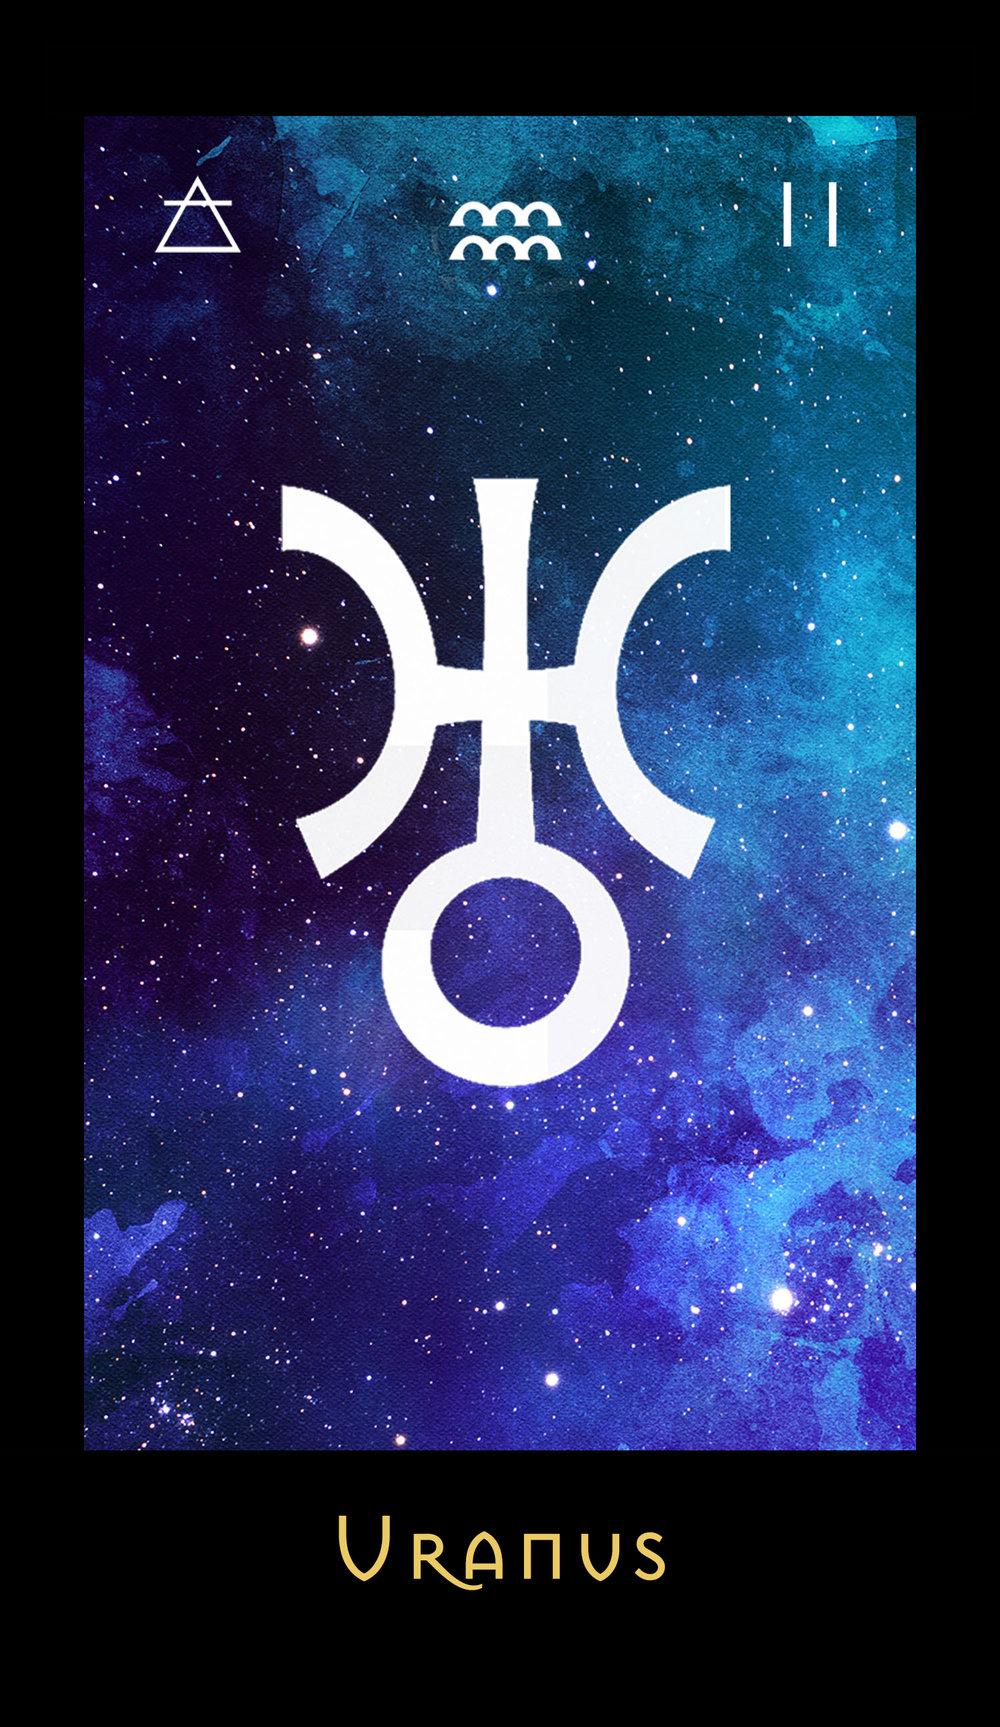 Uranus copy.jpg